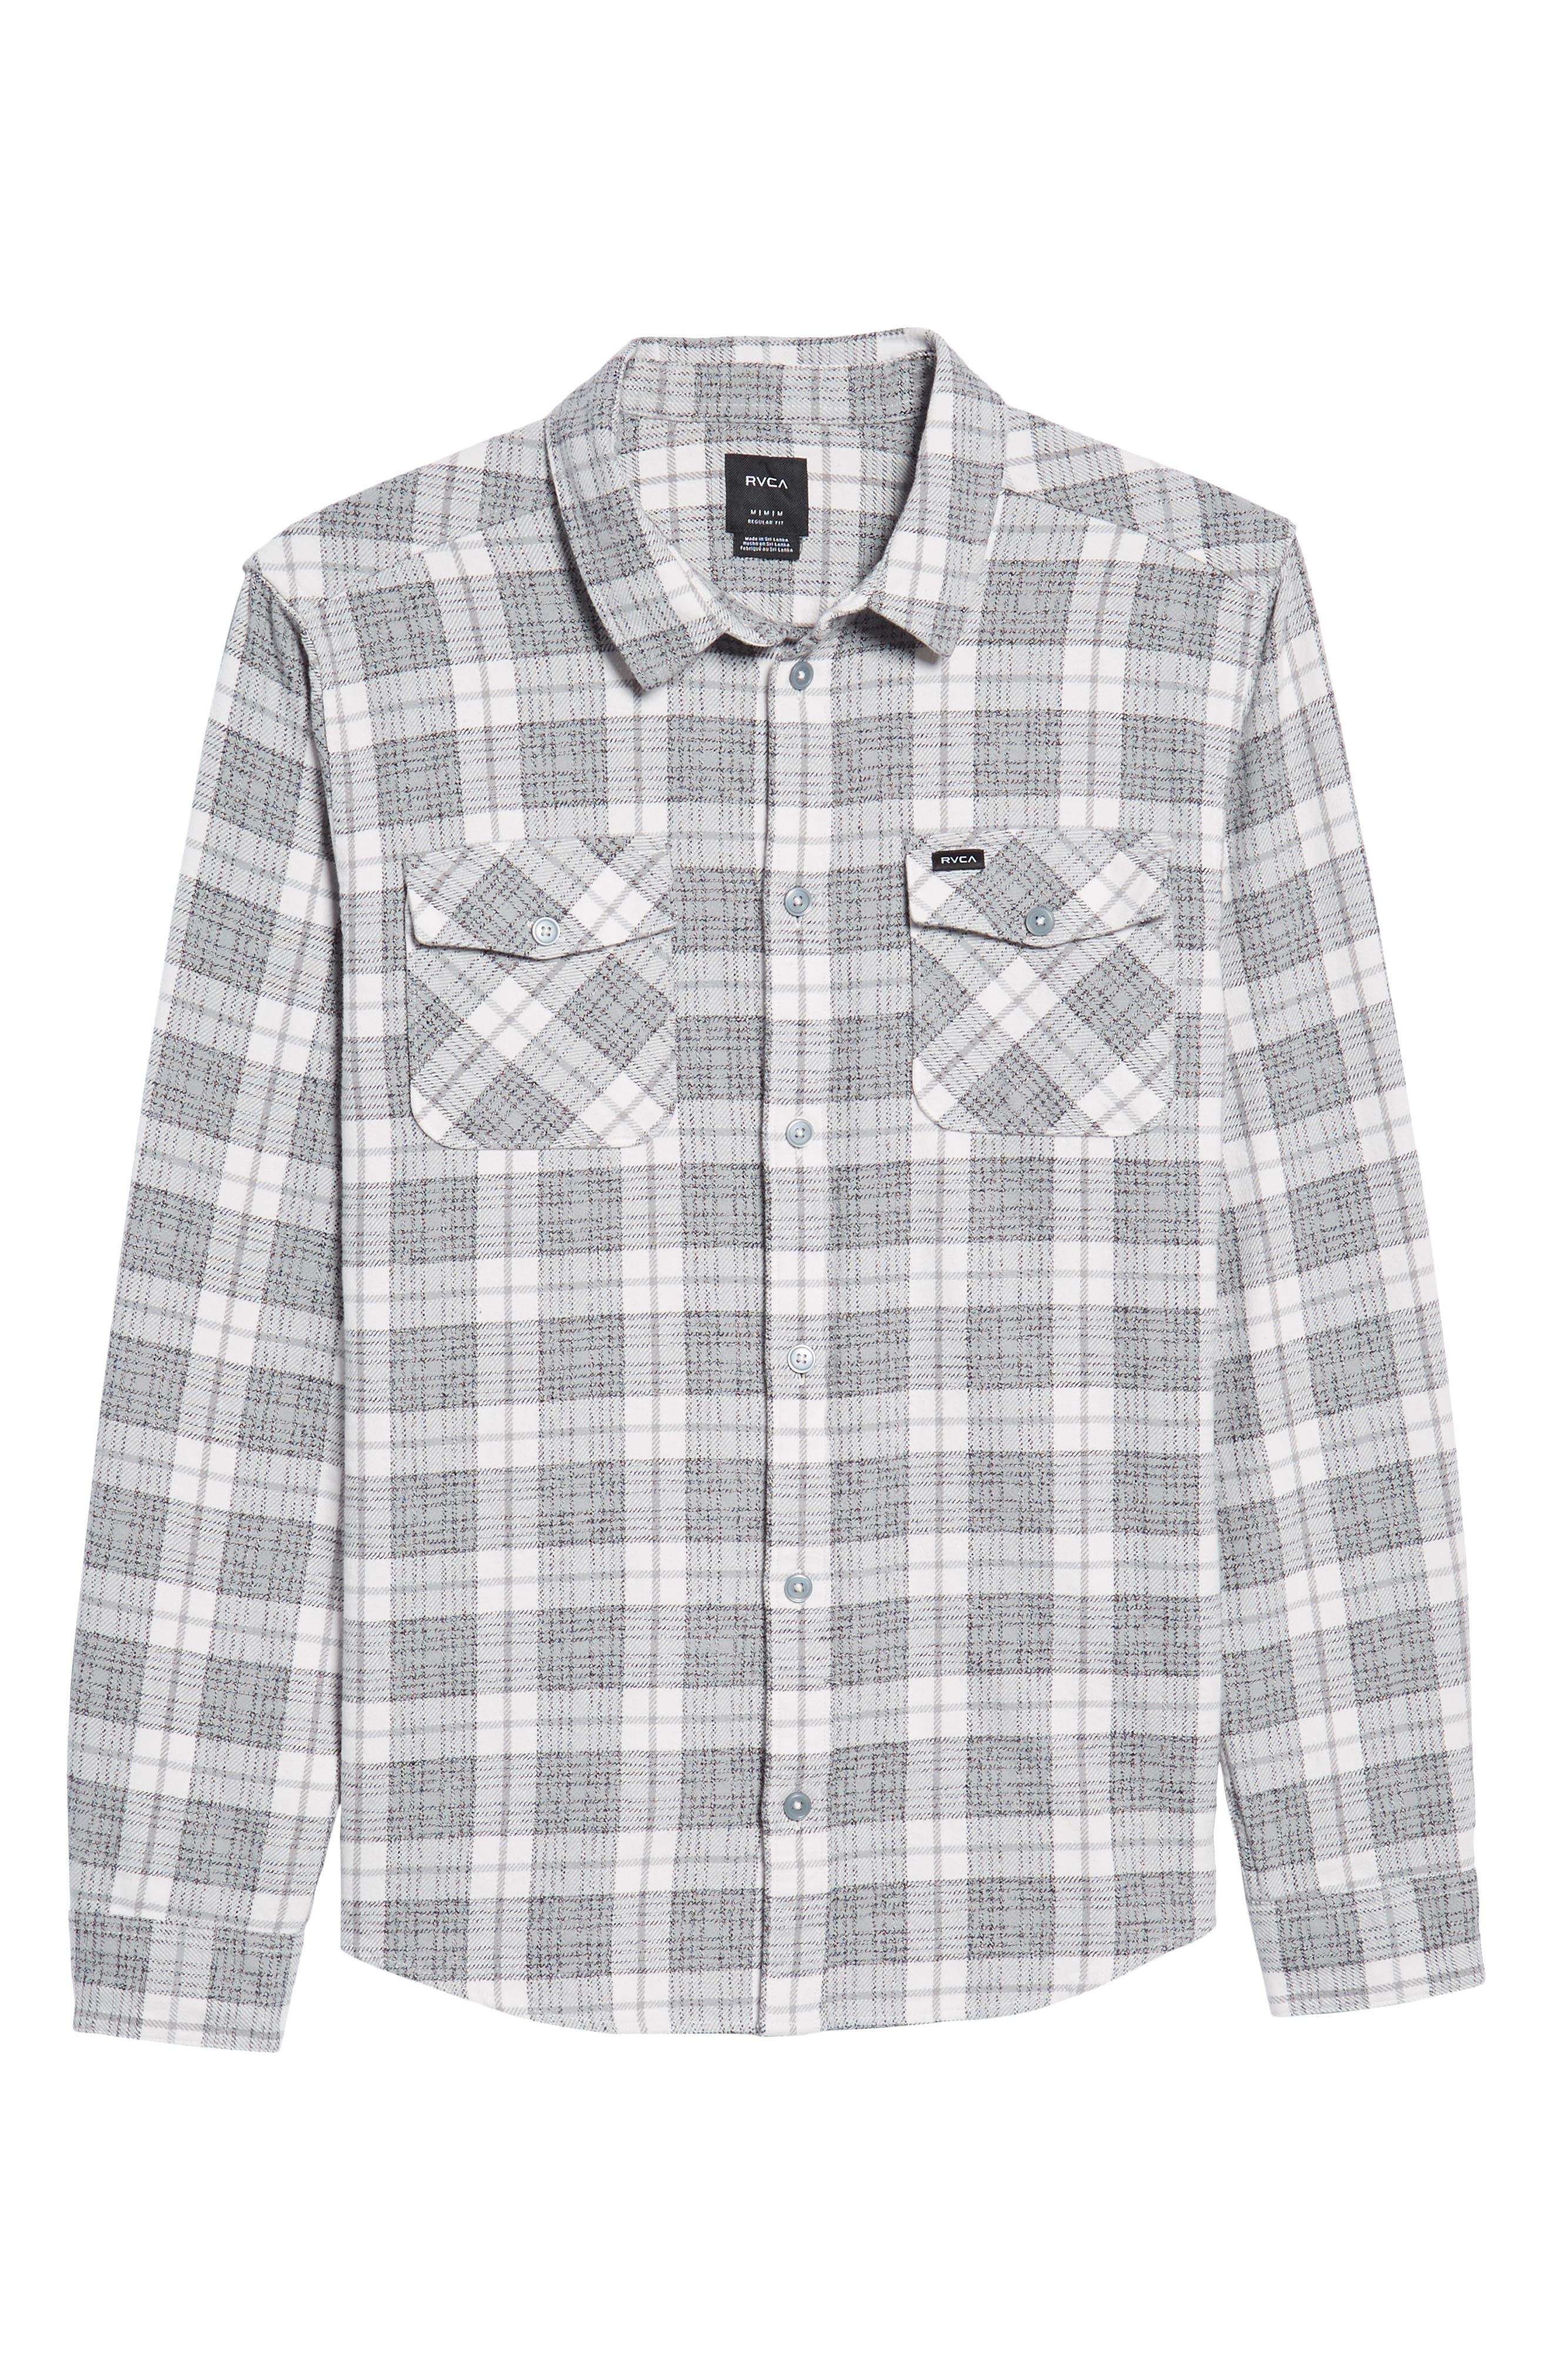 'That'll Work' Trim Fit Plaid Flannel Shirt,                             Alternate thumbnail 6, color,                             ANTIQUE WHITE